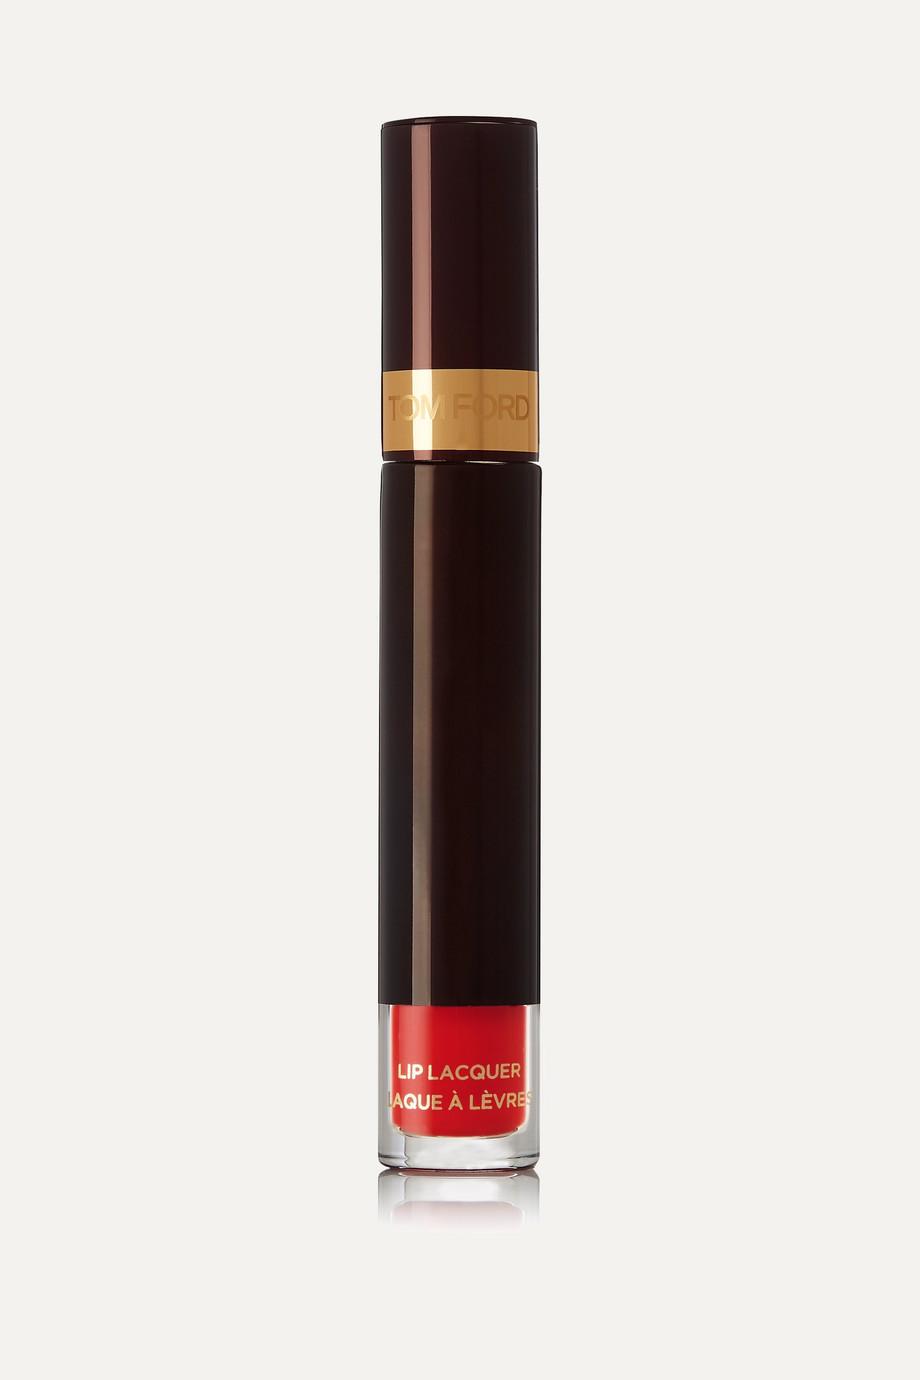 TOM FORD BEAUTY Liquid Patent Lip Lacquer - No Vacancy